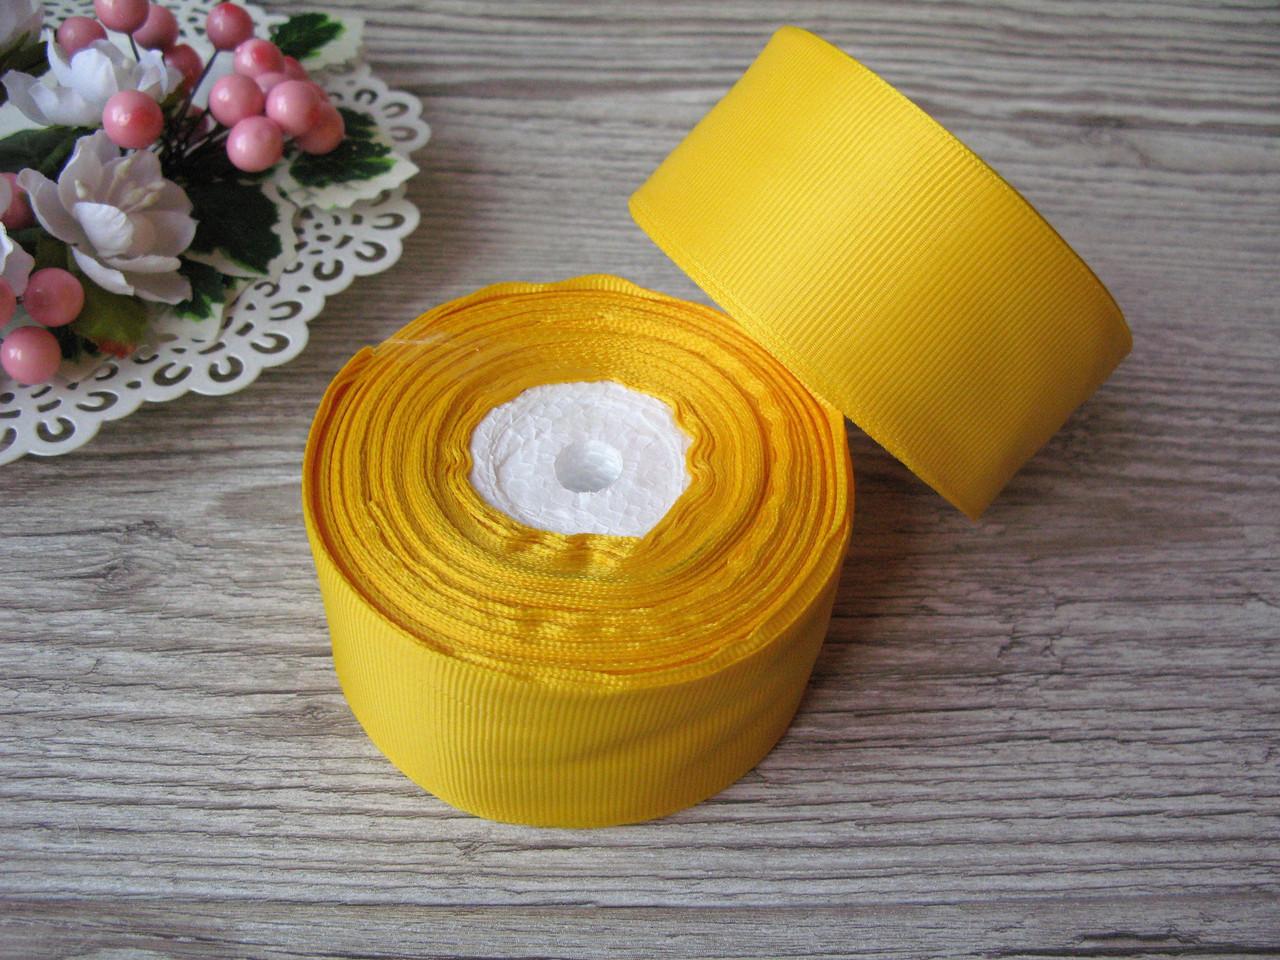 Лента репсовая 4 см темно желтая, бобина 18 м - 51 грн